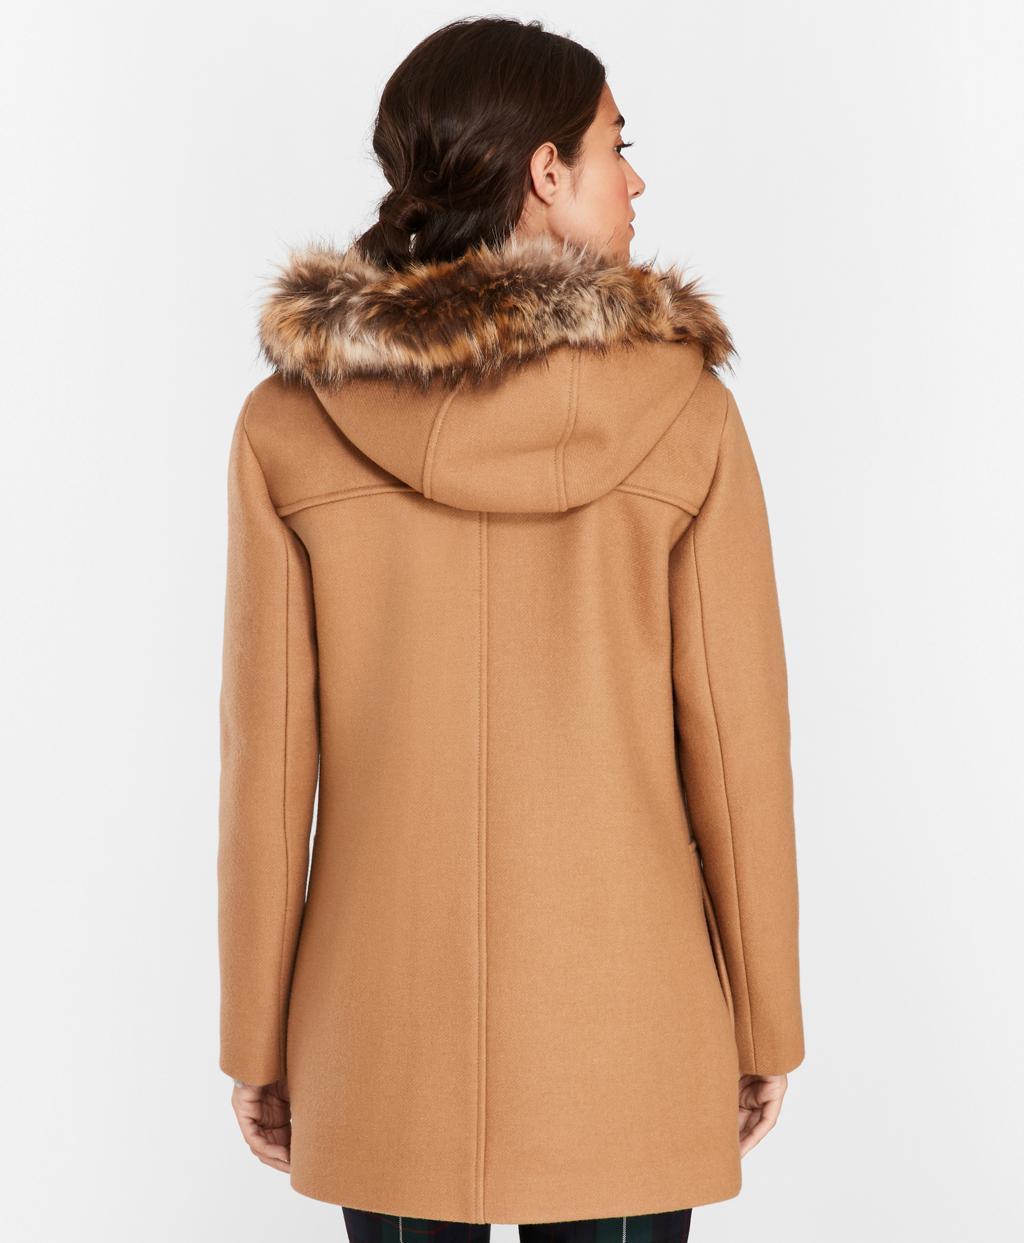 5250e8c46158 ... Double-knit Wool-blend Coat - Lyst. View fullscreen